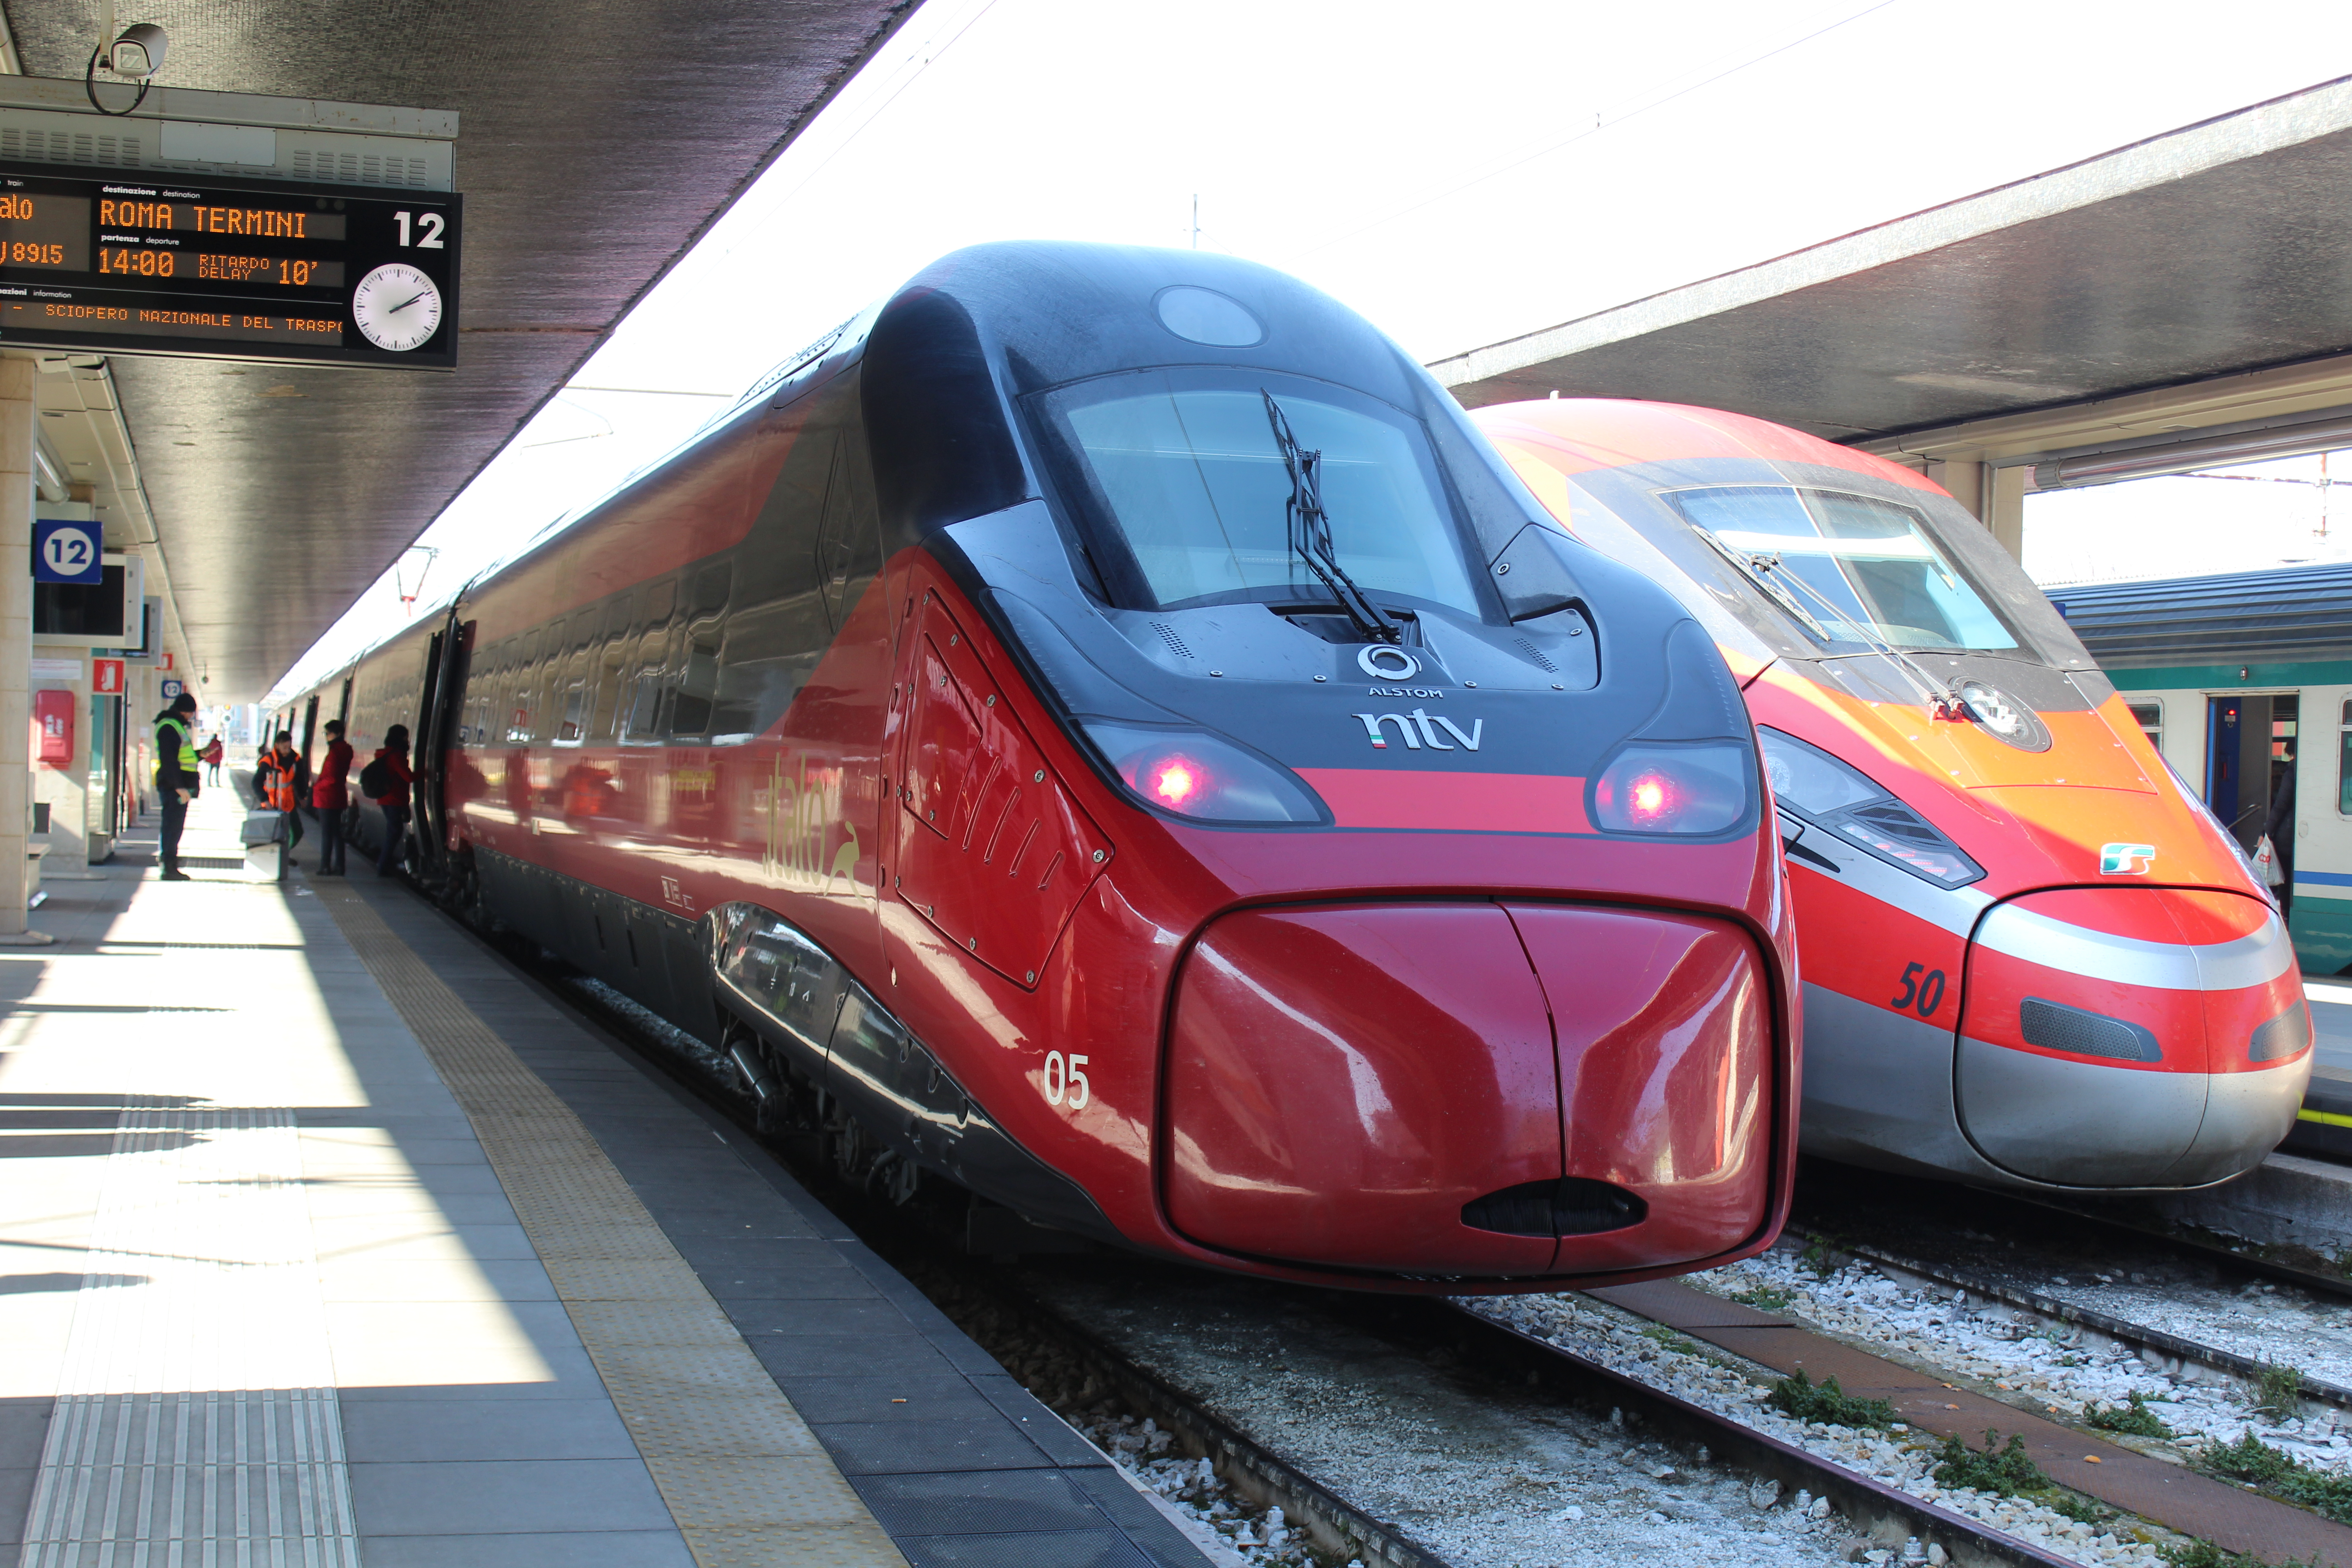 Züge_venedig